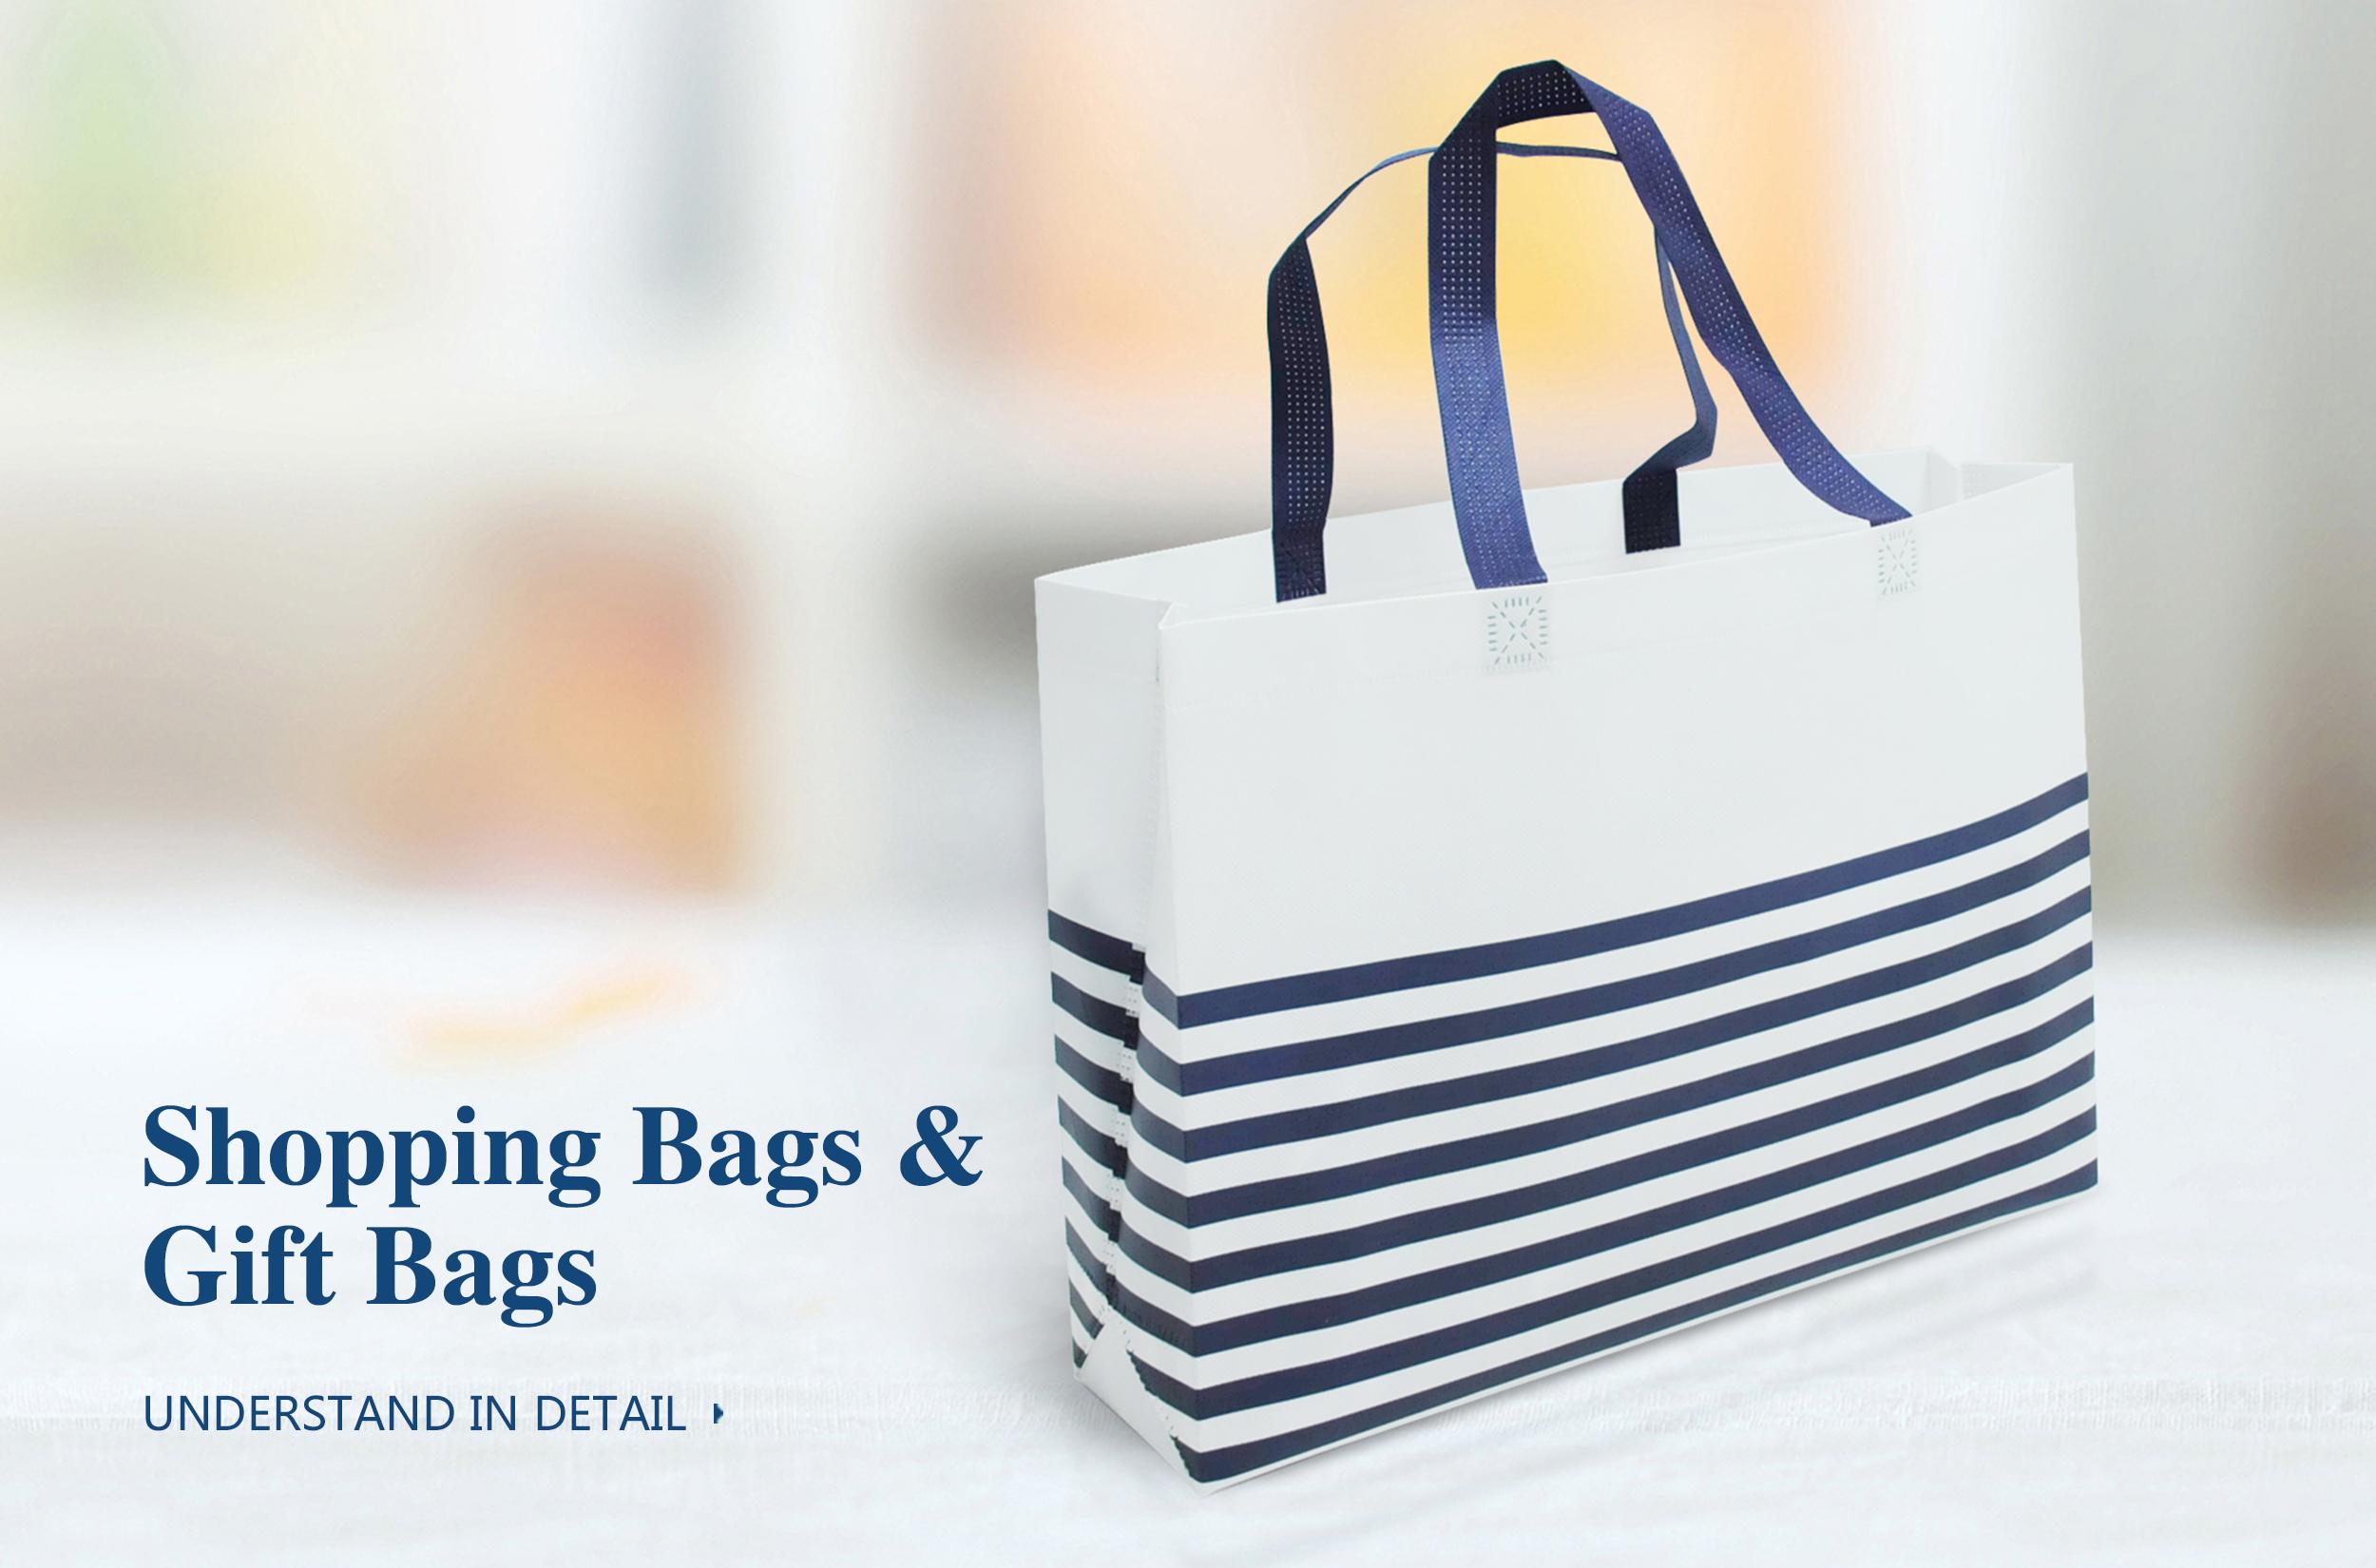 SHOPPING BAGS & GIFT BAGS